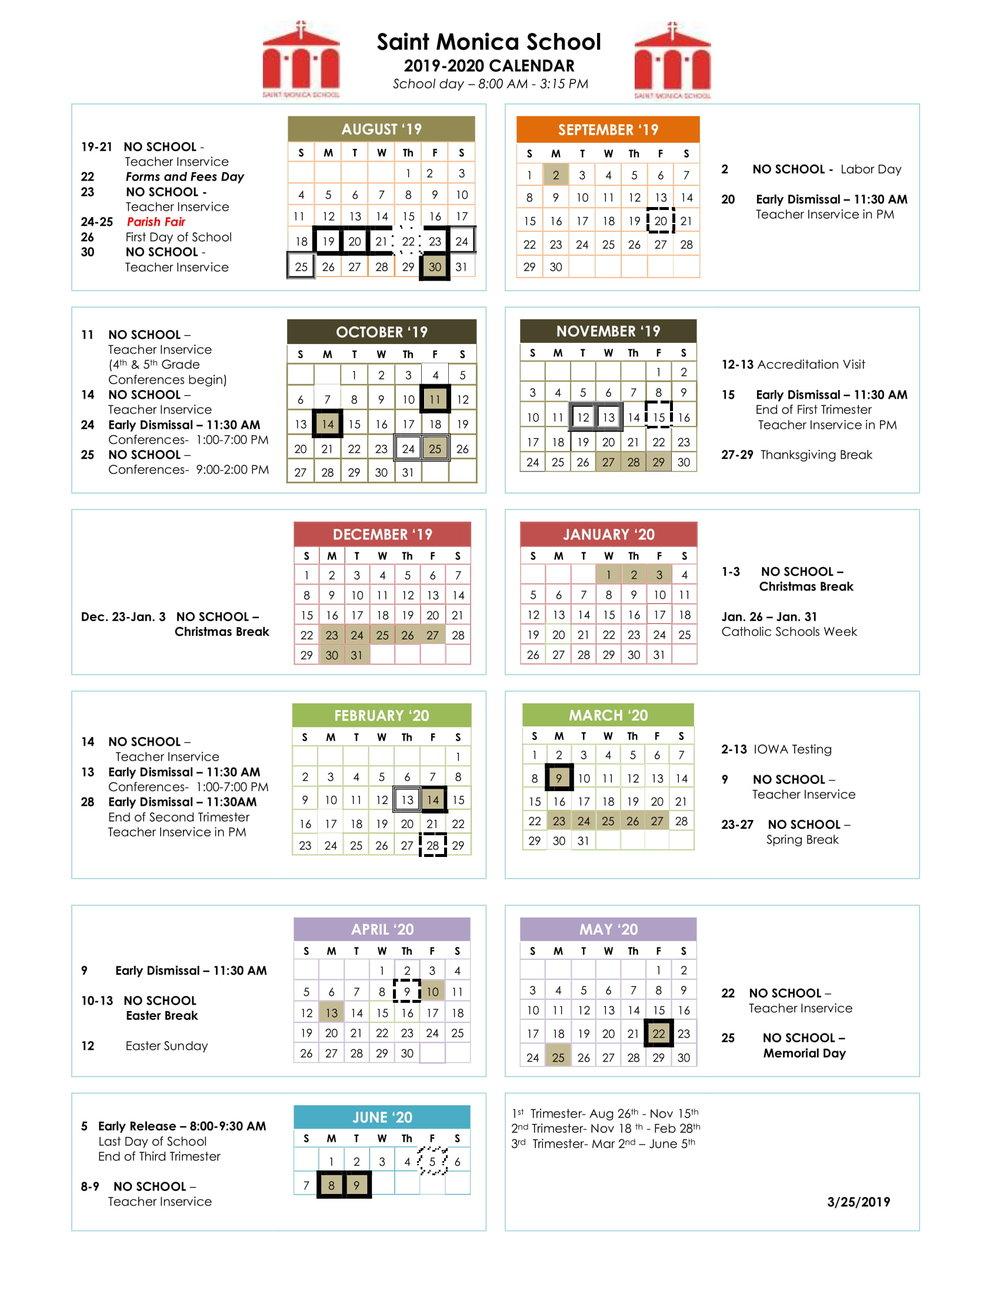 2019-2020 Calendar - SMS (6)-1.jpg